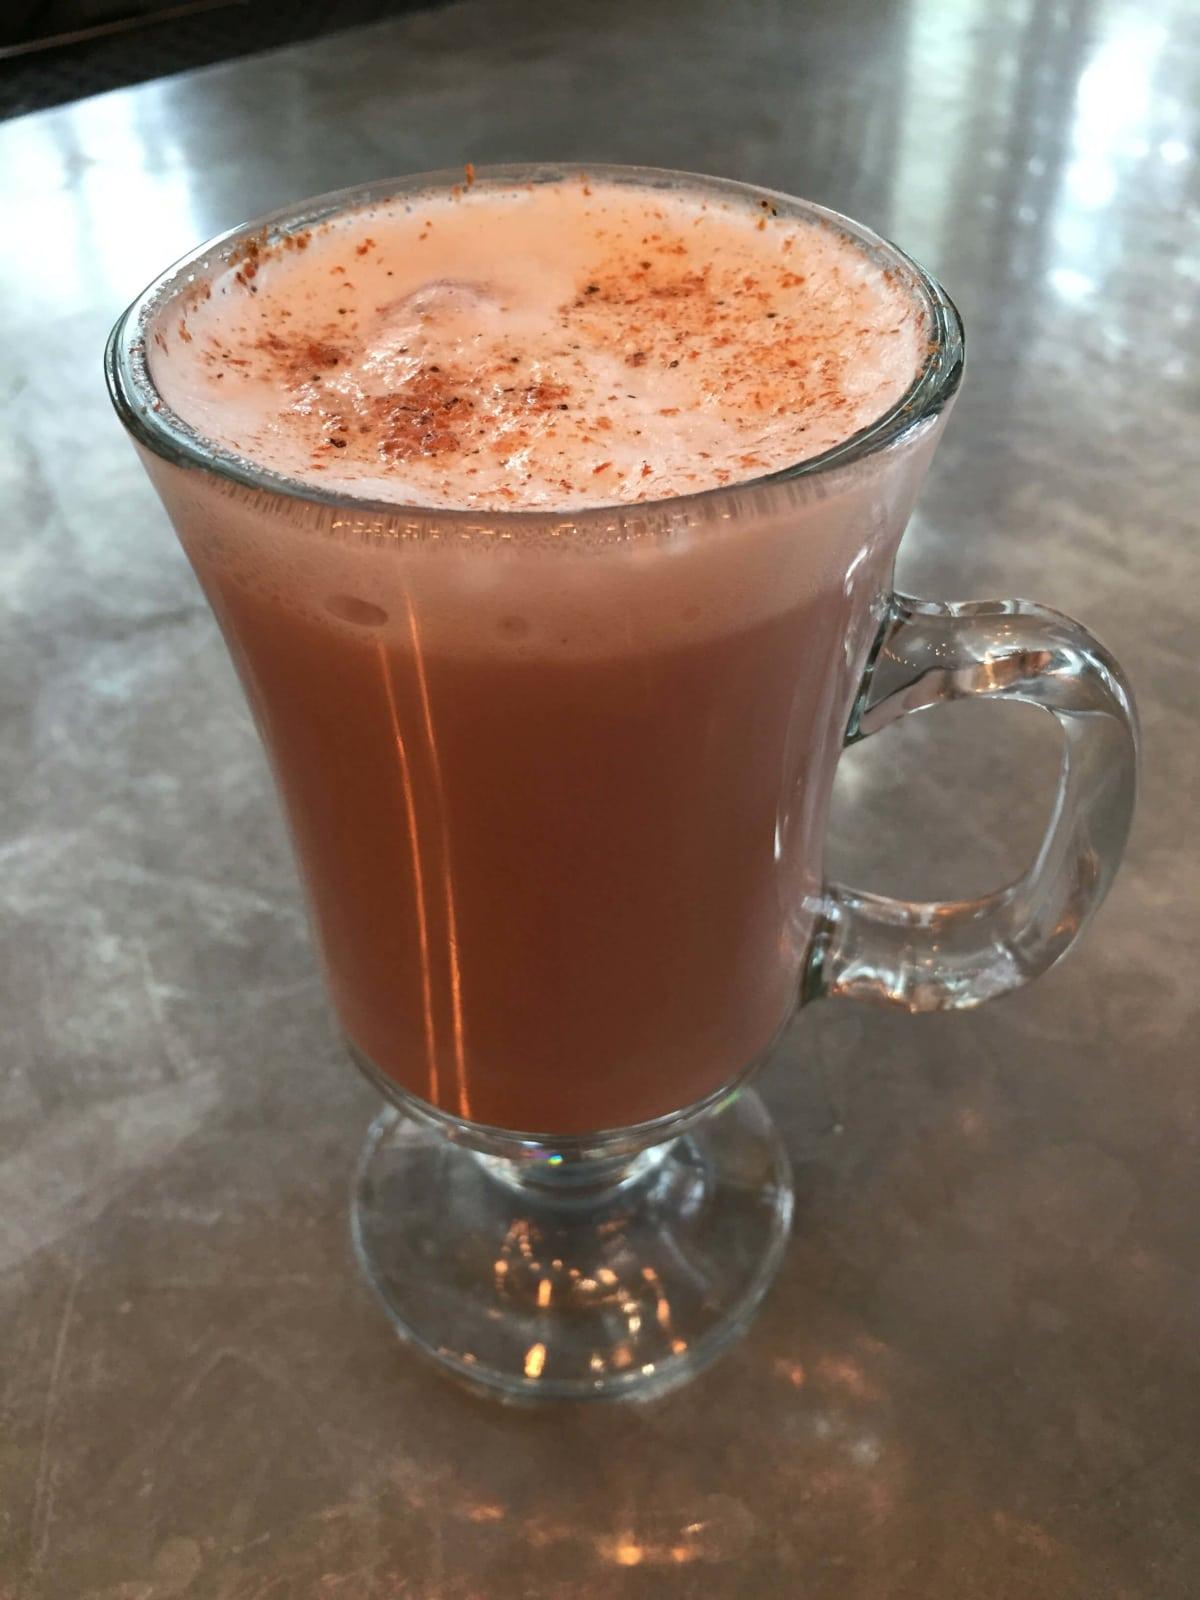 CookieChata cocktail at Cook Hall